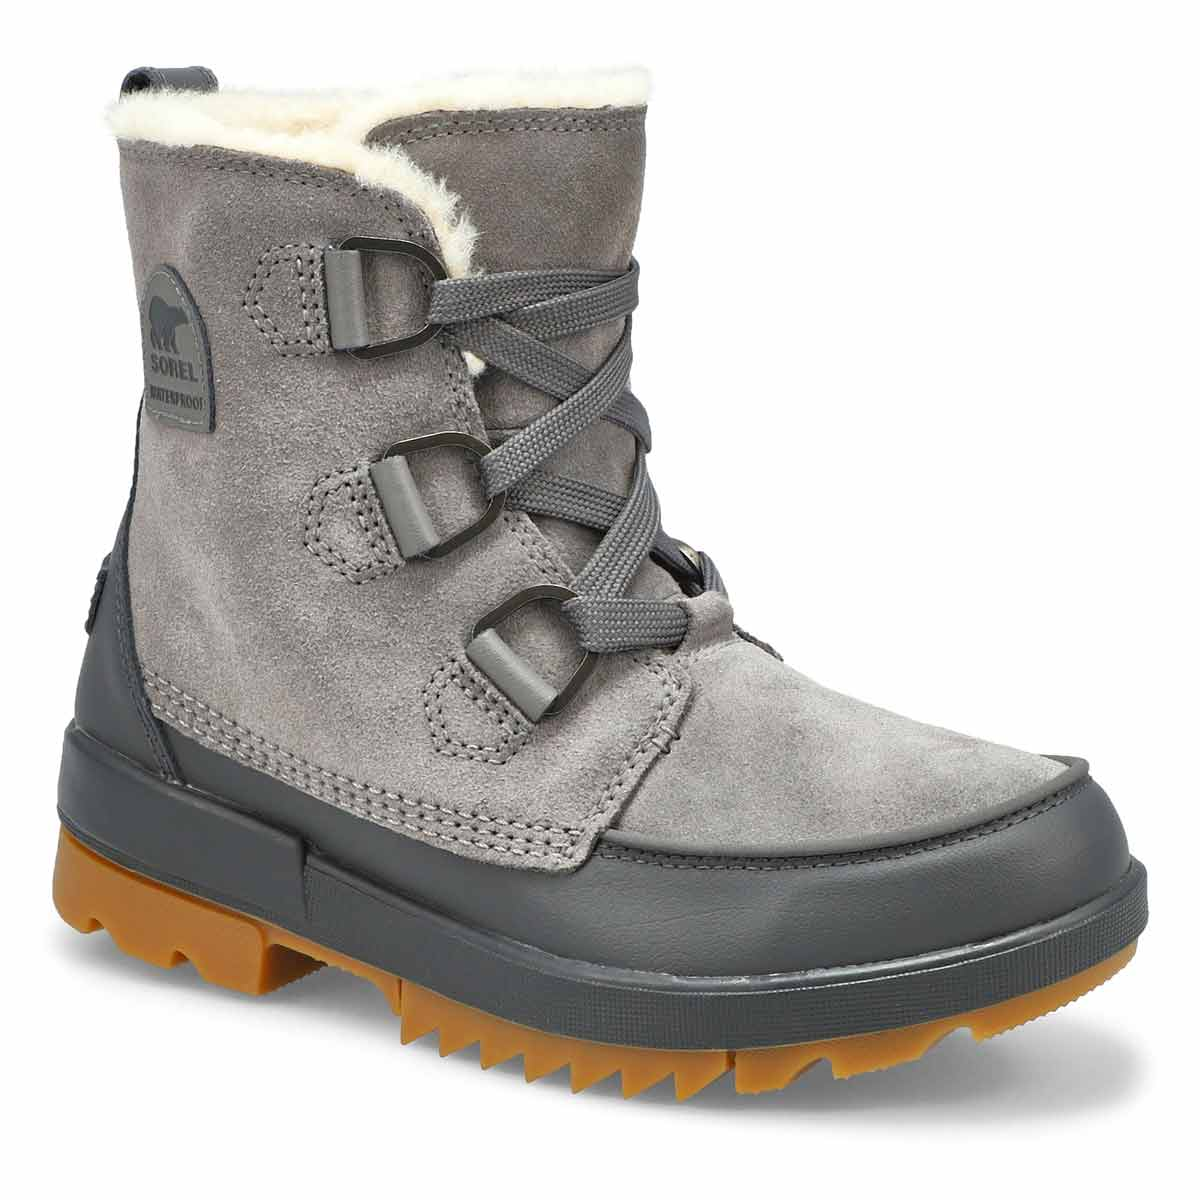 Lds Tivoli IV quarry wtpf boot